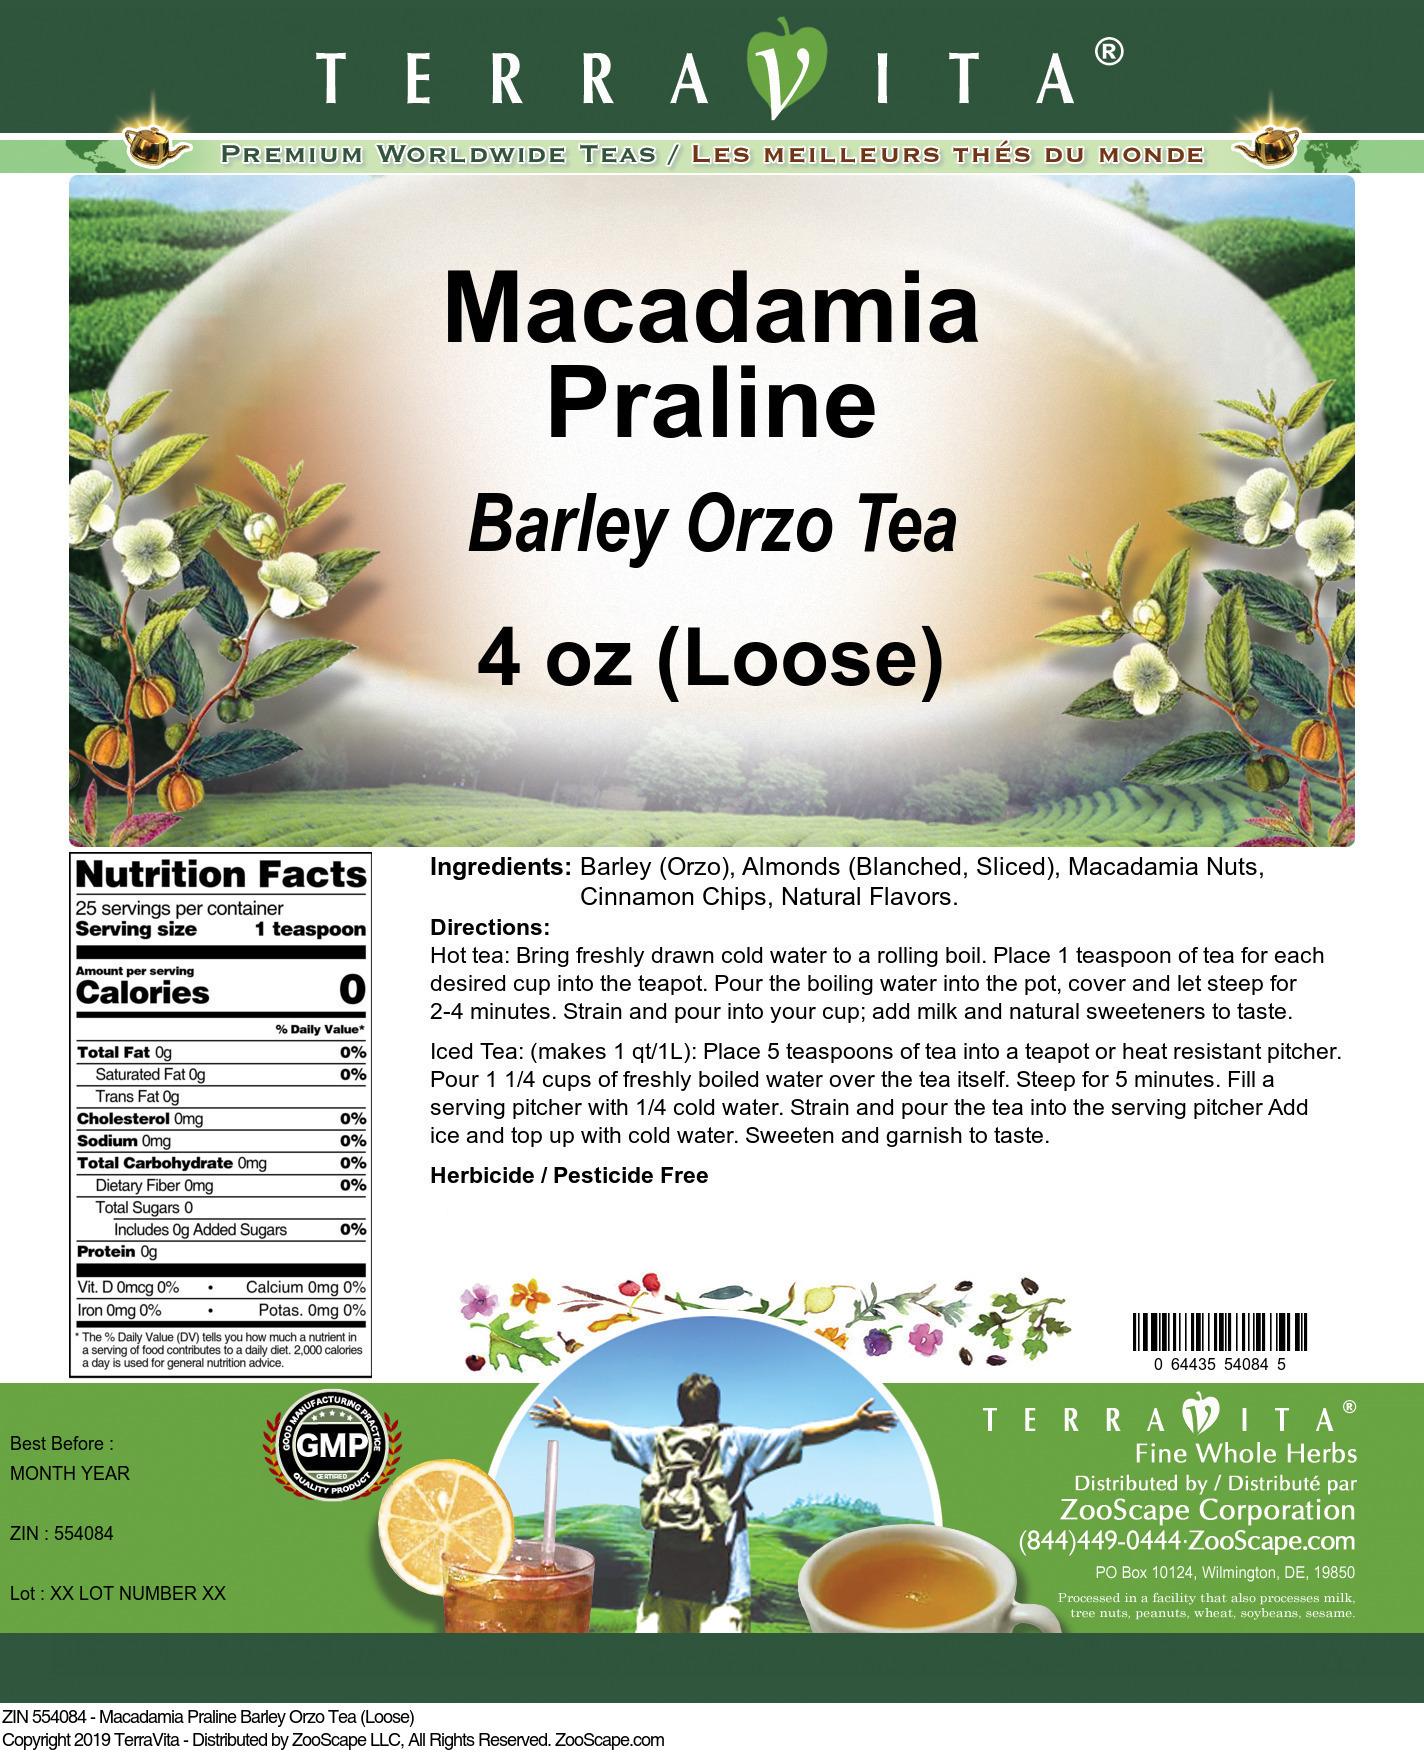 Macadamia Praline Barley Orzo Tea (Loose)